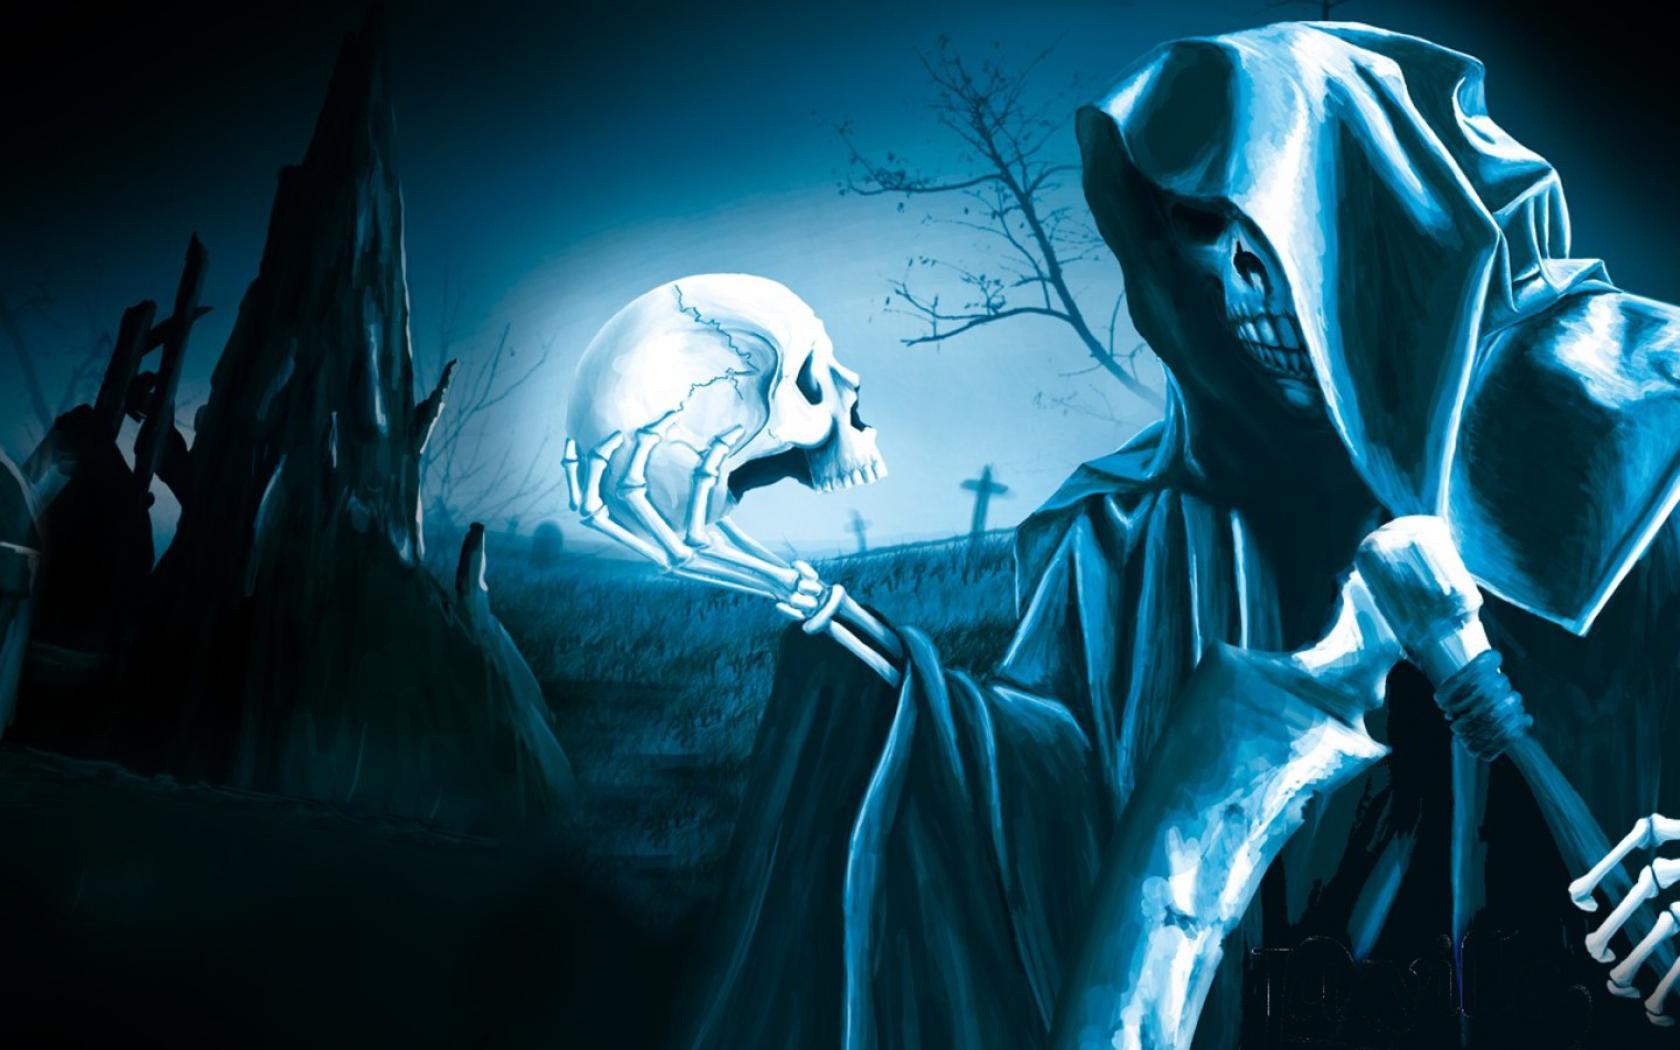 Grim Reaper With Wings Wallpaper wallpaper wallpaper hd 1680x1050